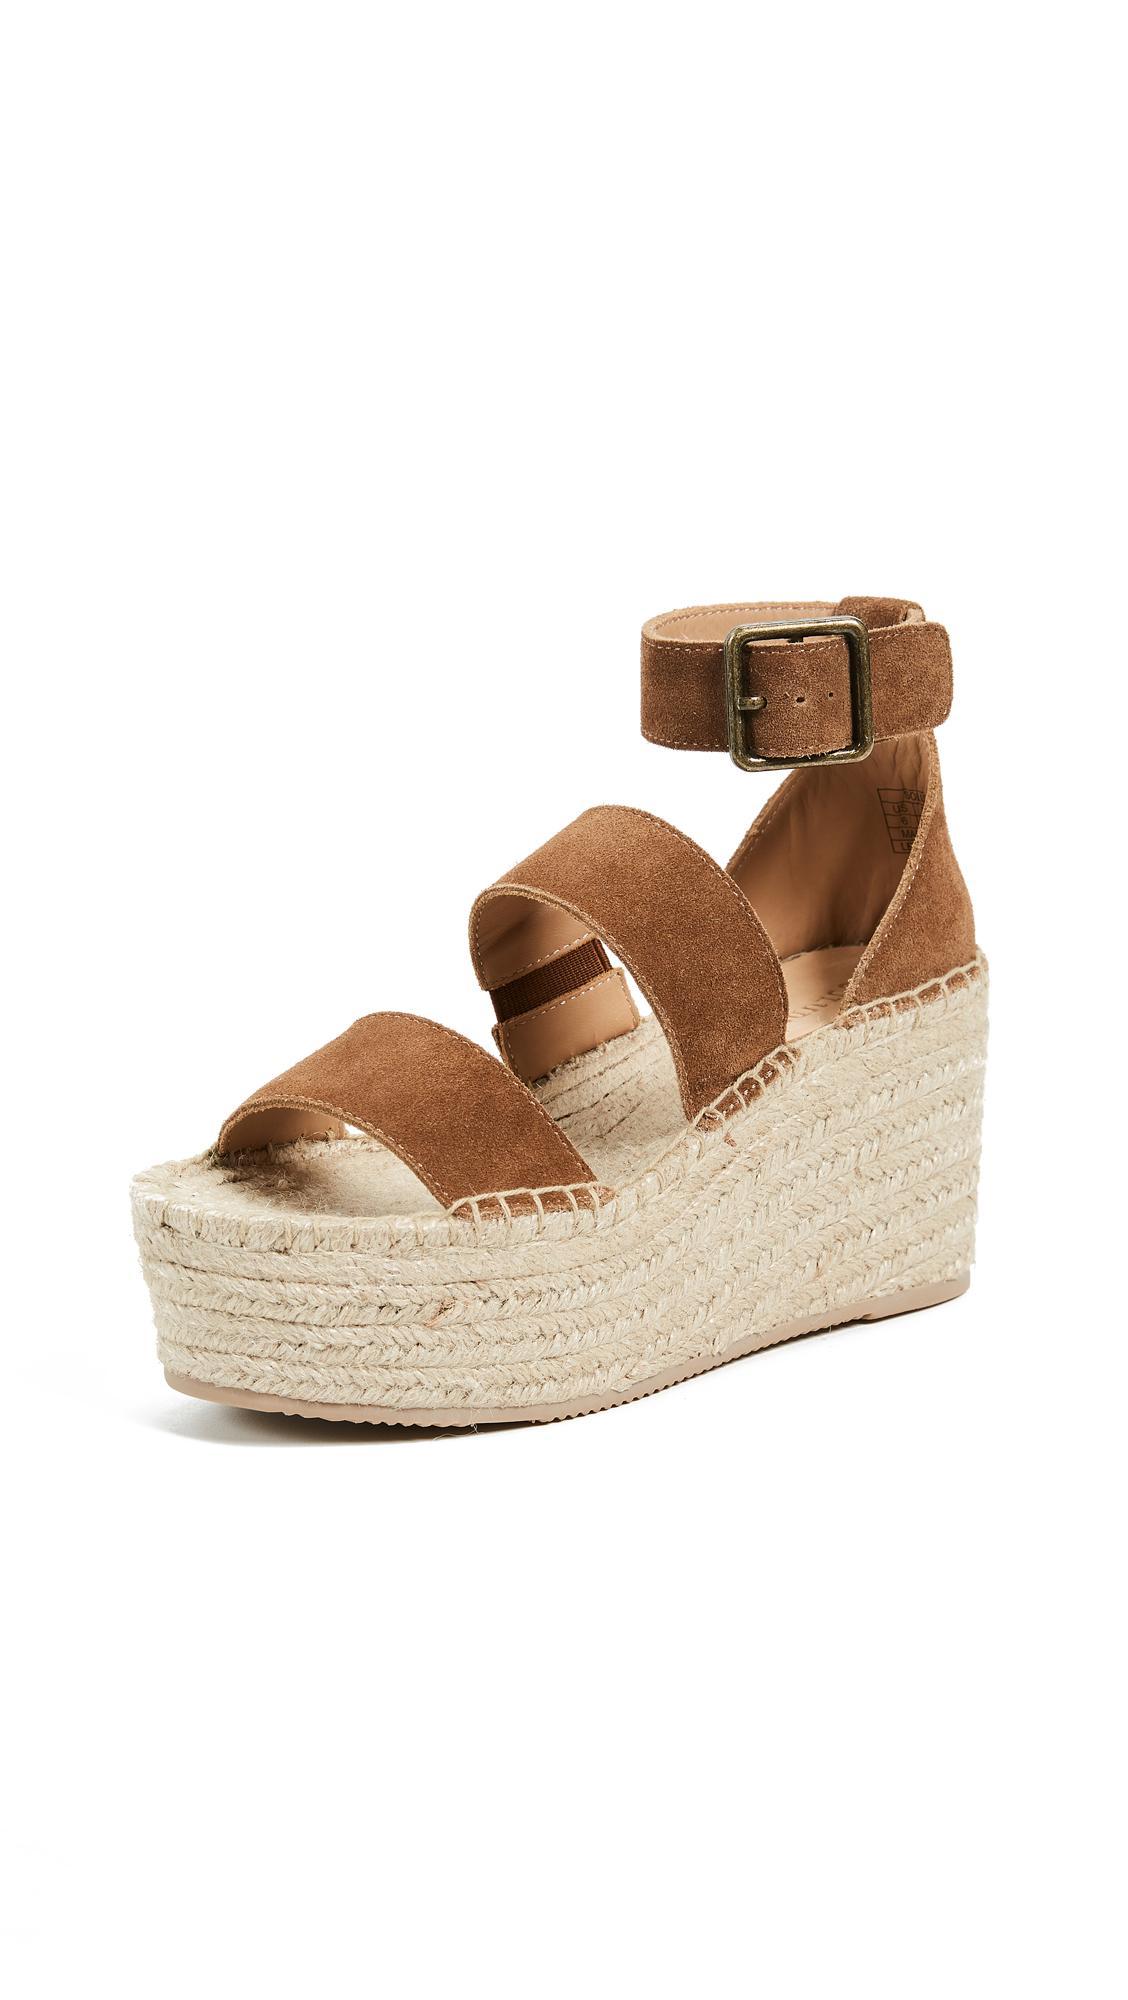 bc5d32513b61 Soludos Palma Platform Espadrille Sandal In Walnut